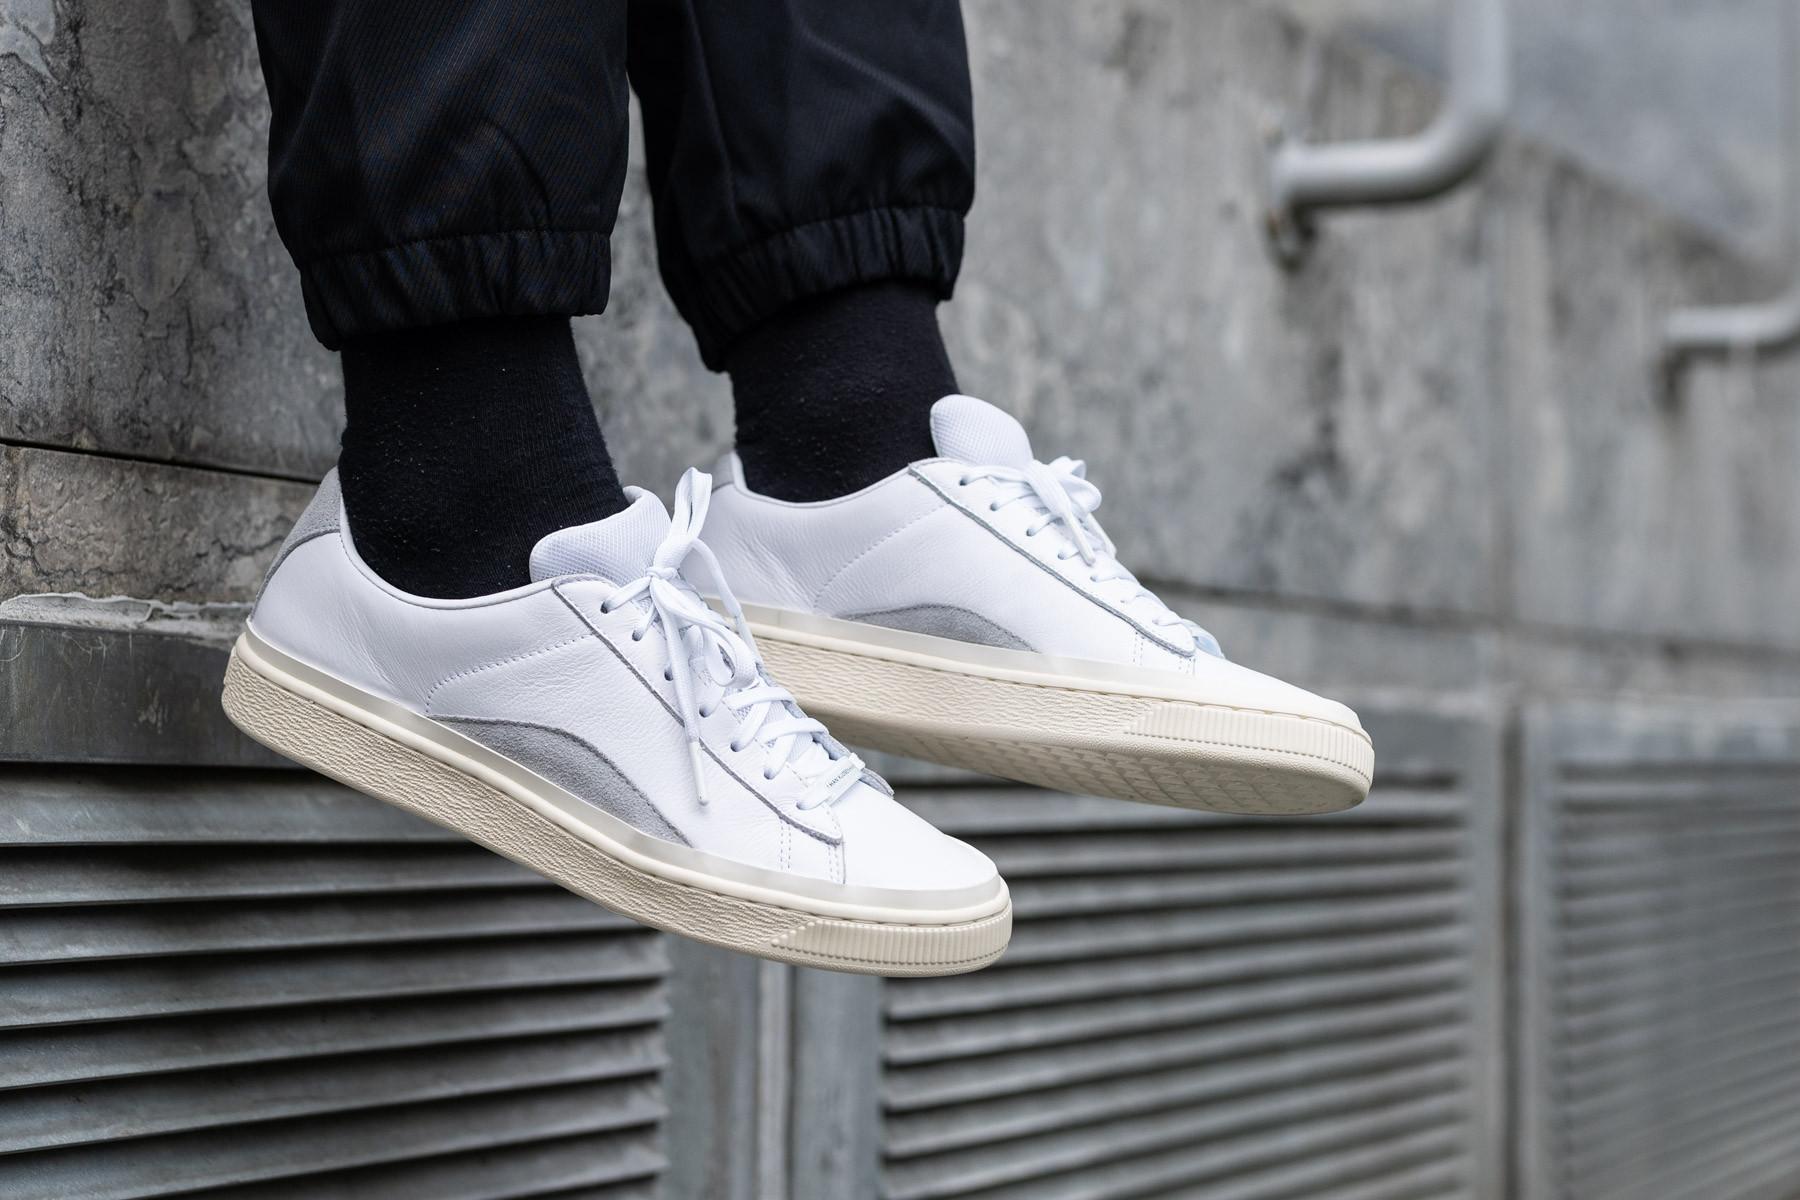 classic fit 9f75f c894a Puma x HAN Basket - Sneaker.no